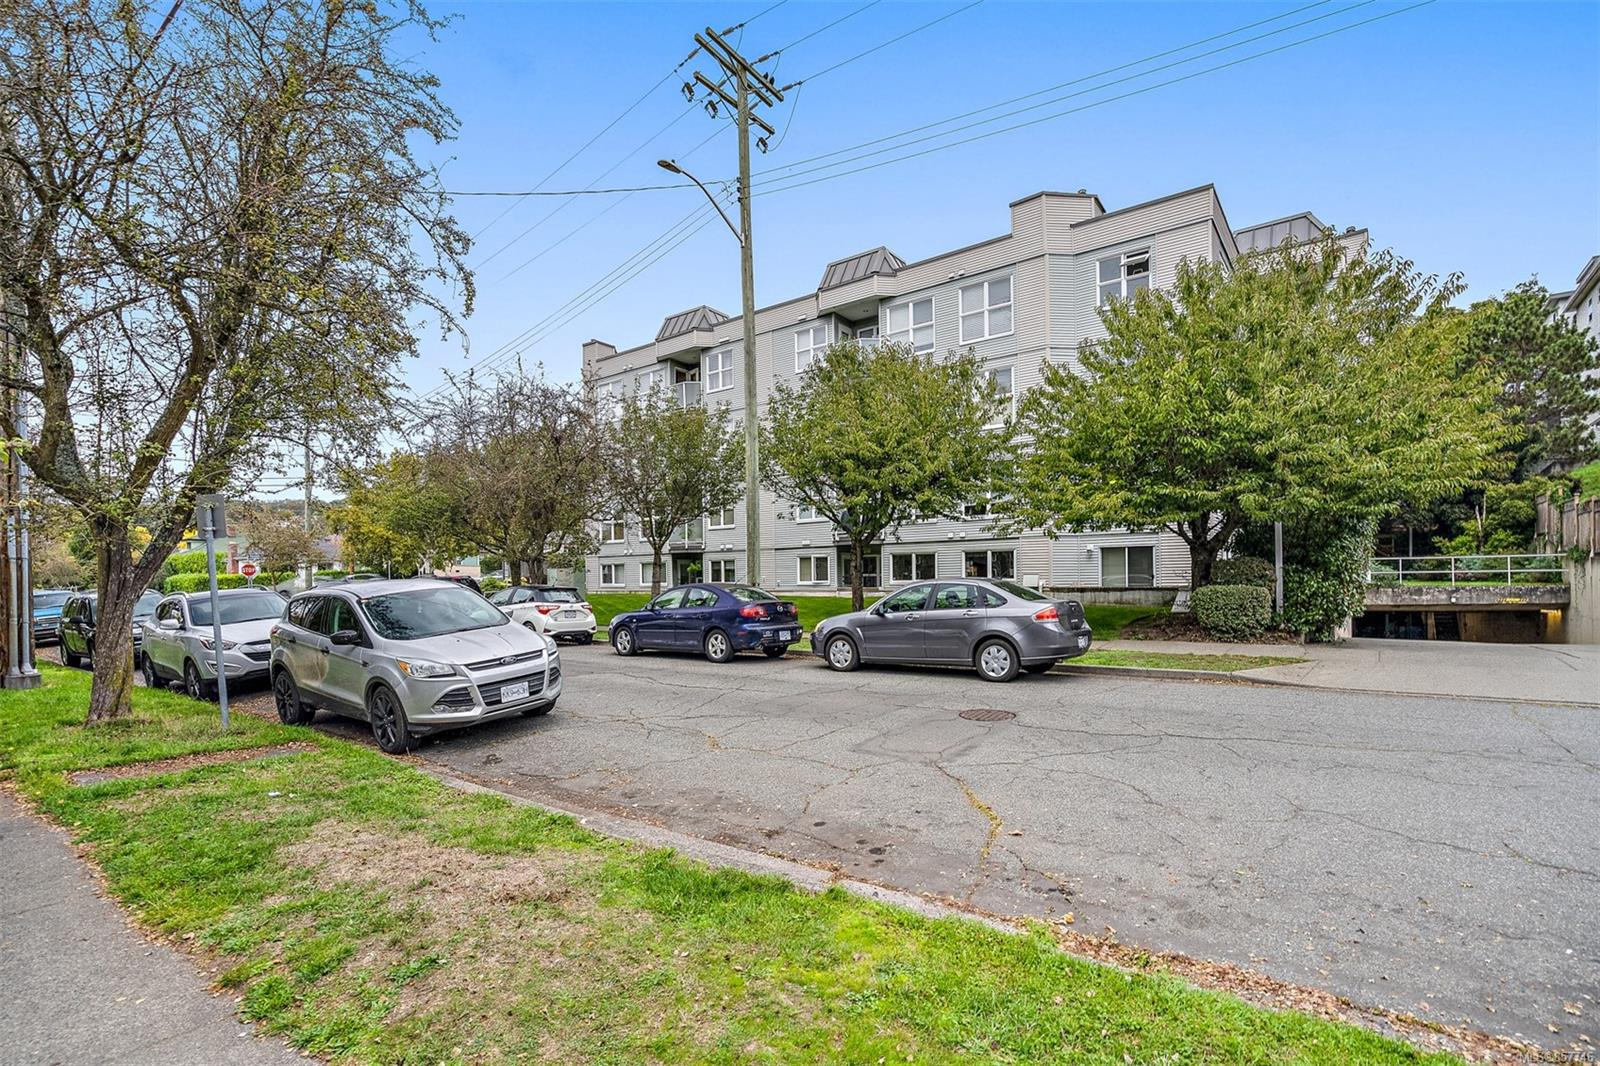 Photo 25 at 301 - 1201 Hillside Avenue, Hillside, Victoria